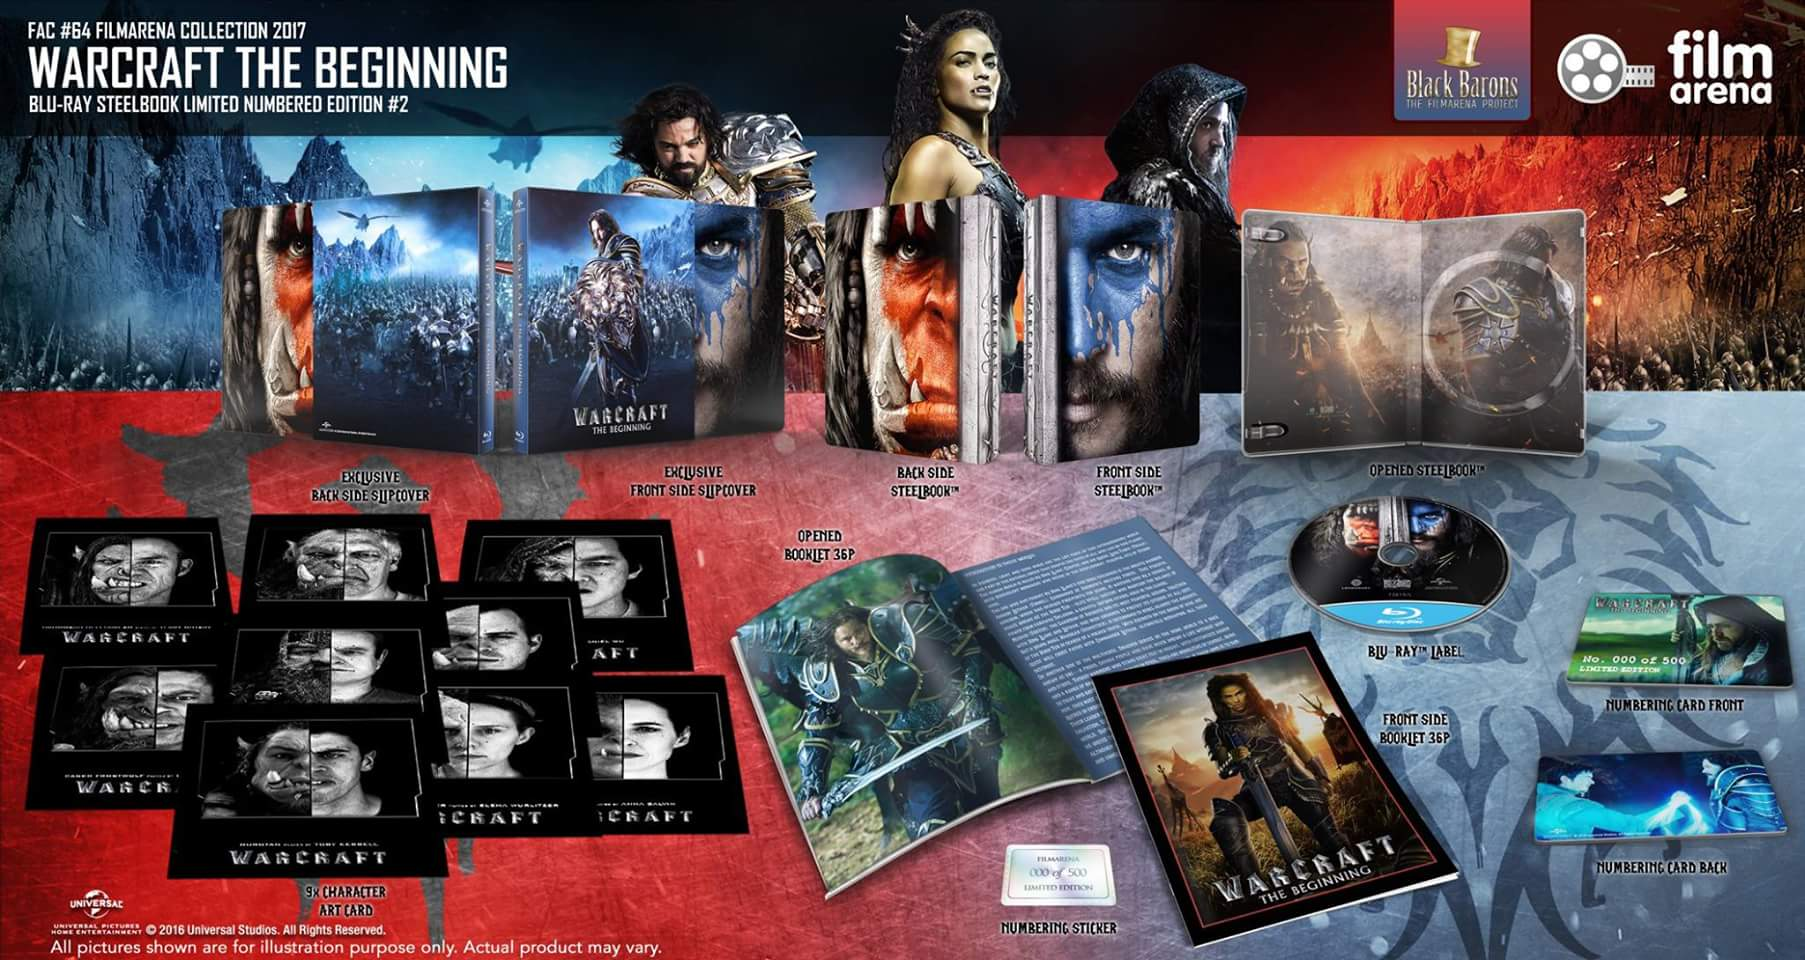 Warcraft steelbook filmarena 2